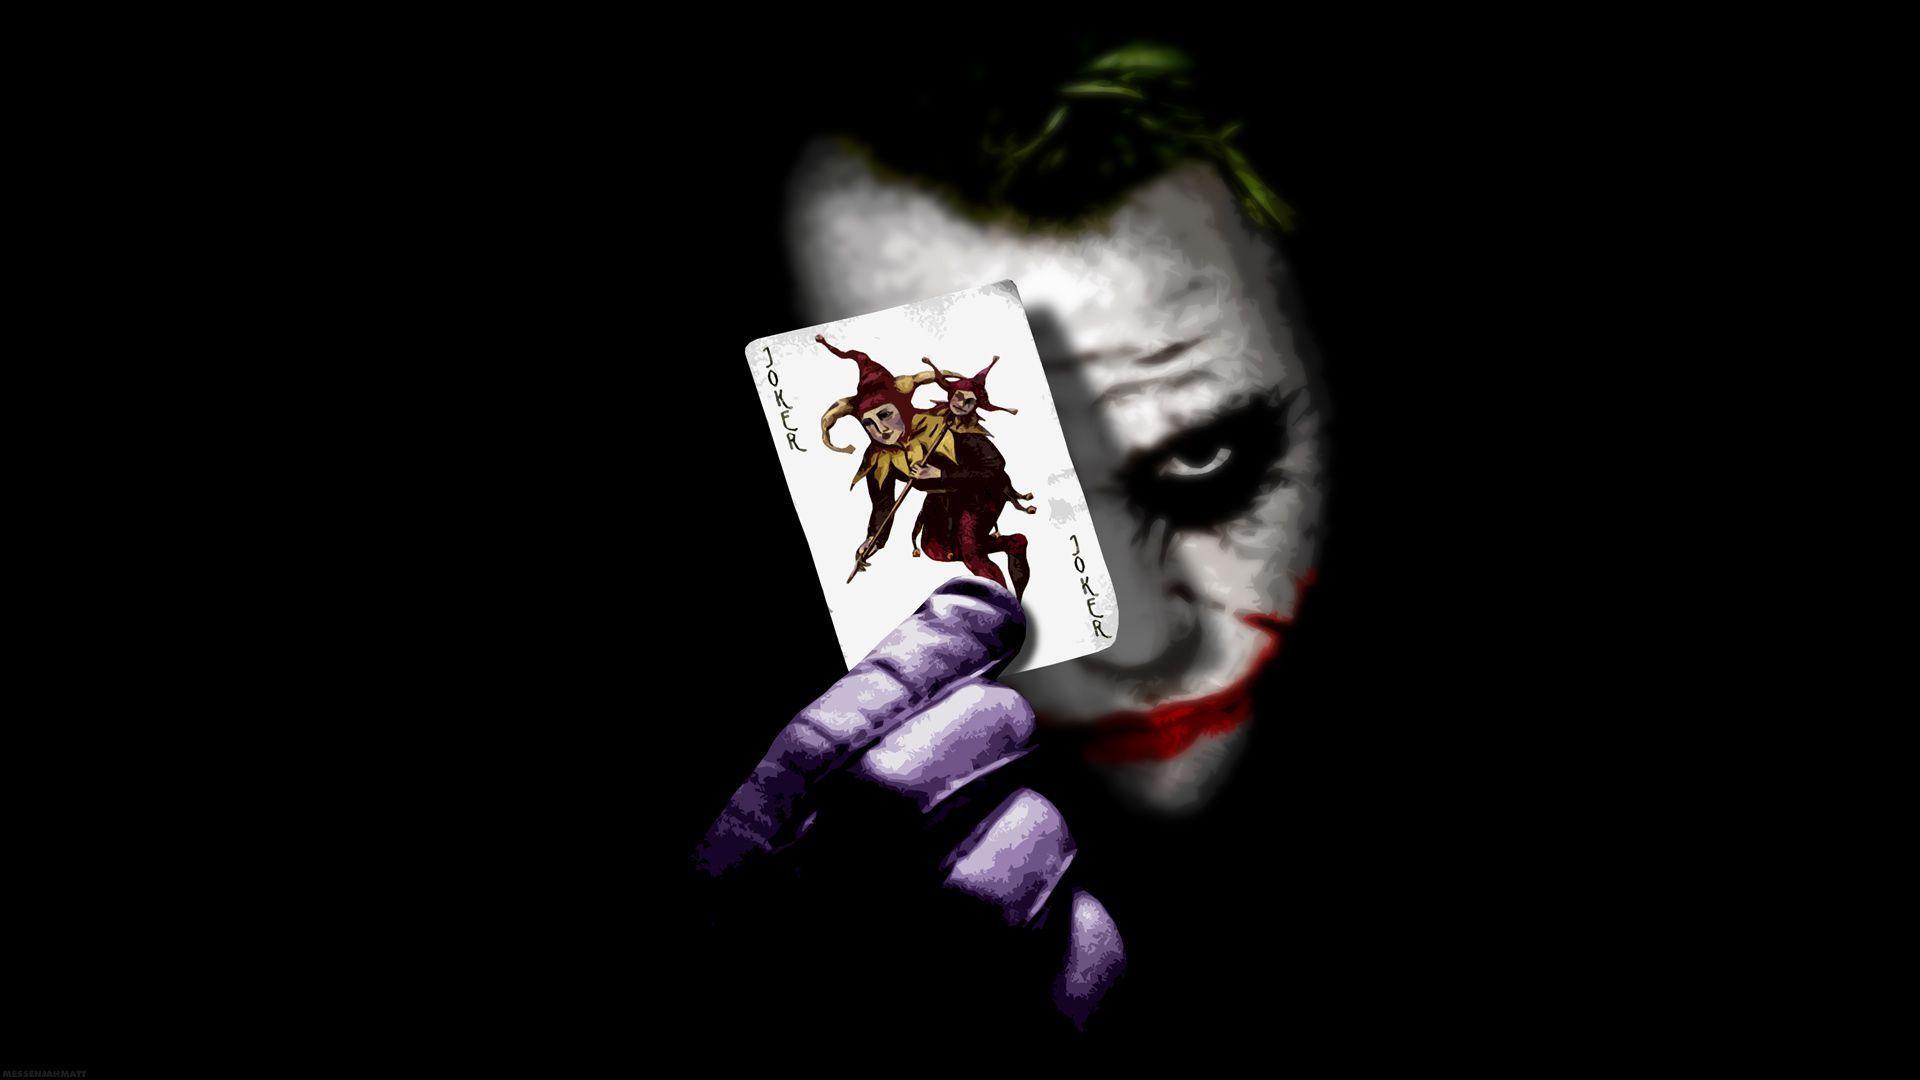 Joker Hd Wallpapers Wallpaper Cave Joker Wallpapers Joker Hd